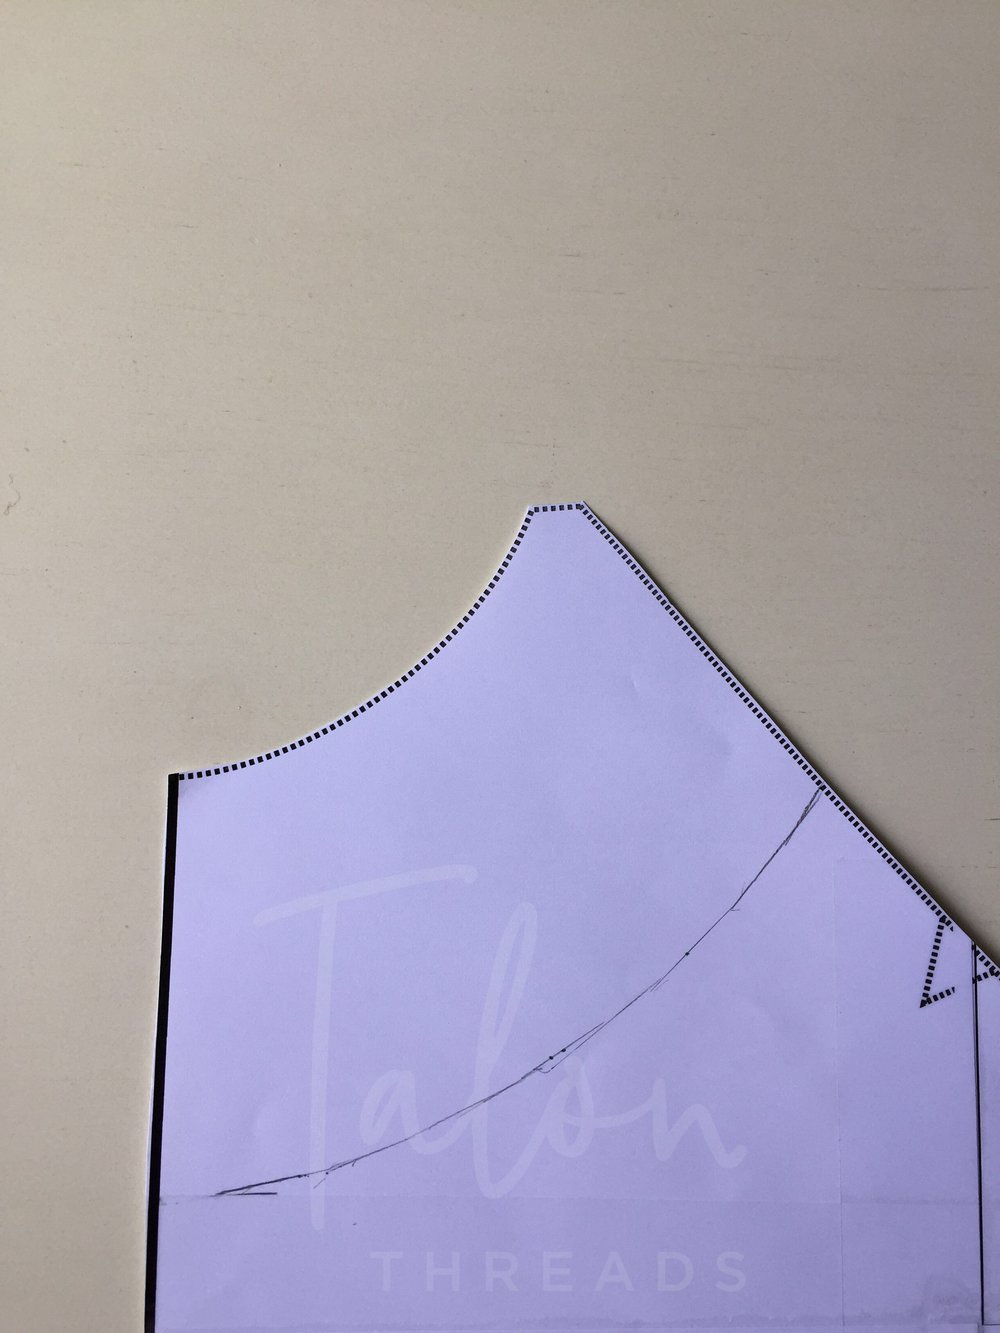 Creating the new neckline